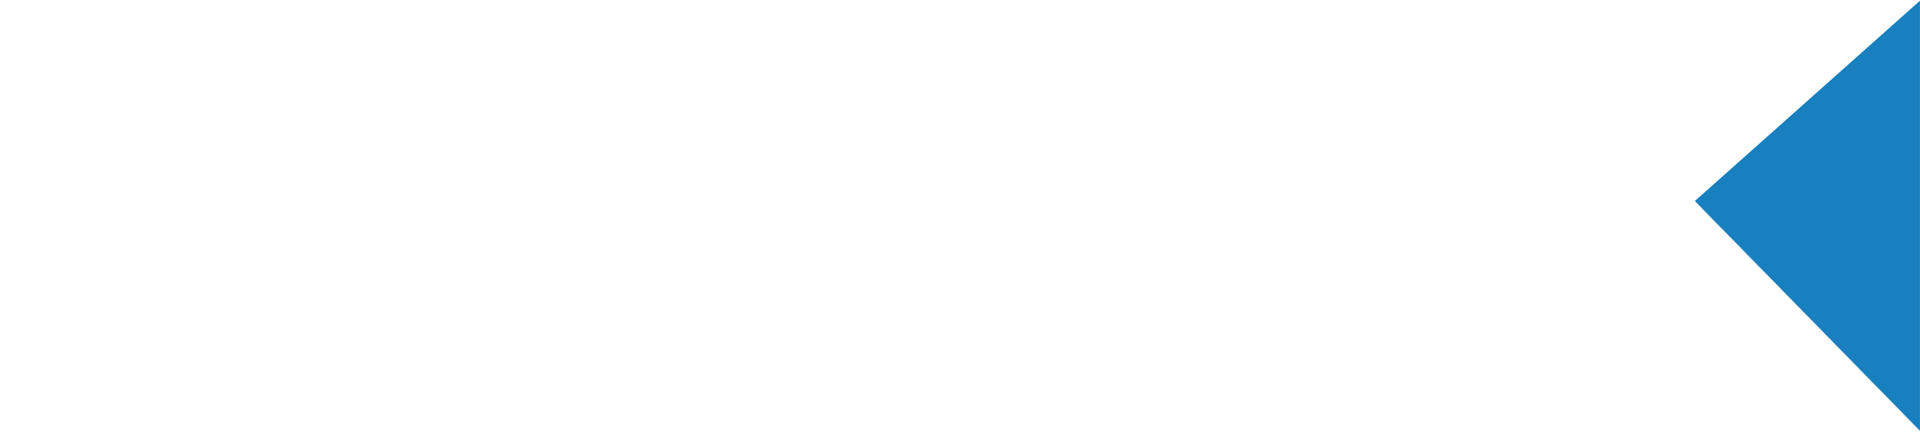 shape-white-top